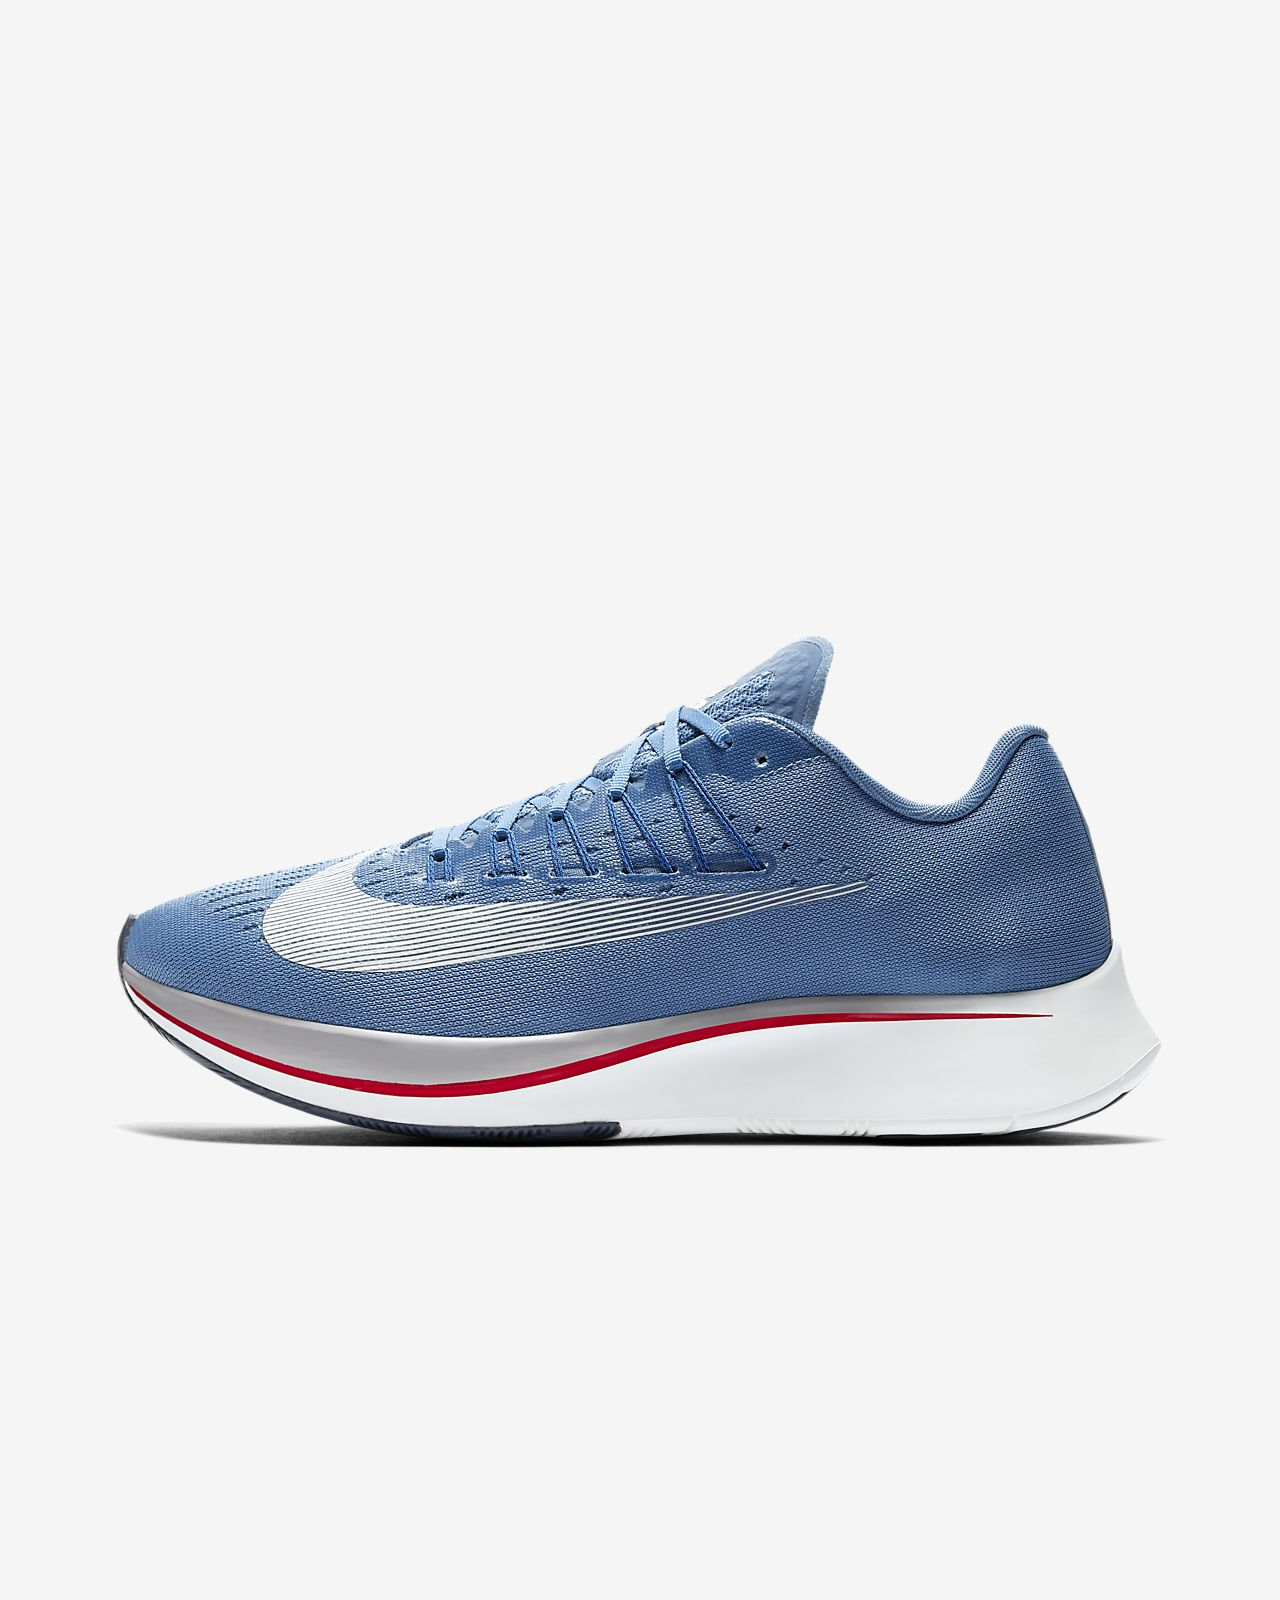 NIKE Chaussures de Running Zoom Fly - Homme - Bleu